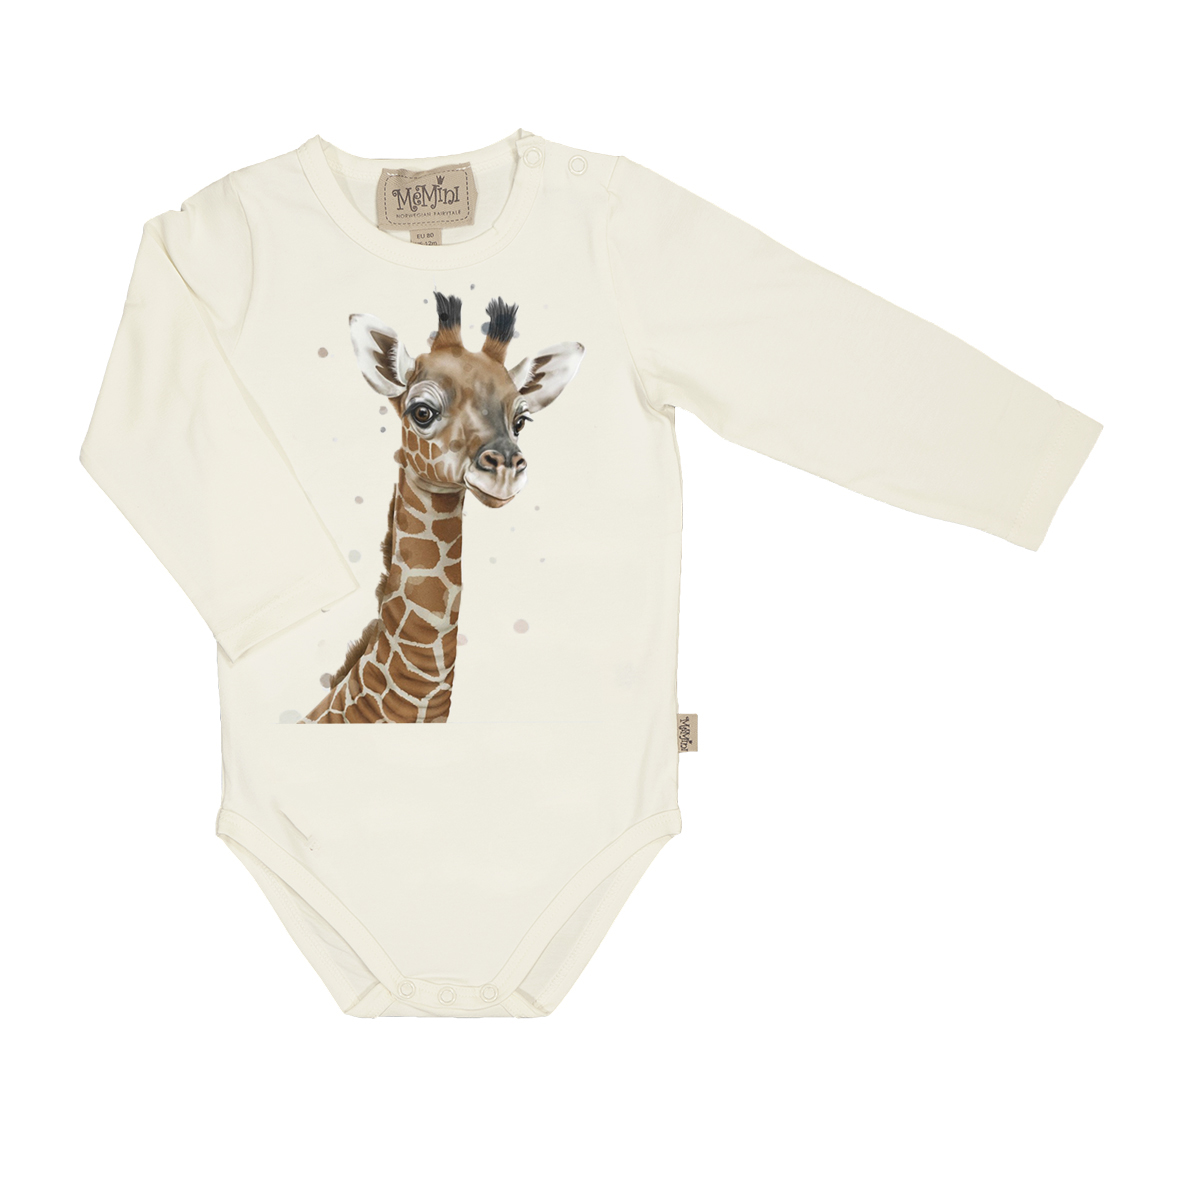 Memini body giraff